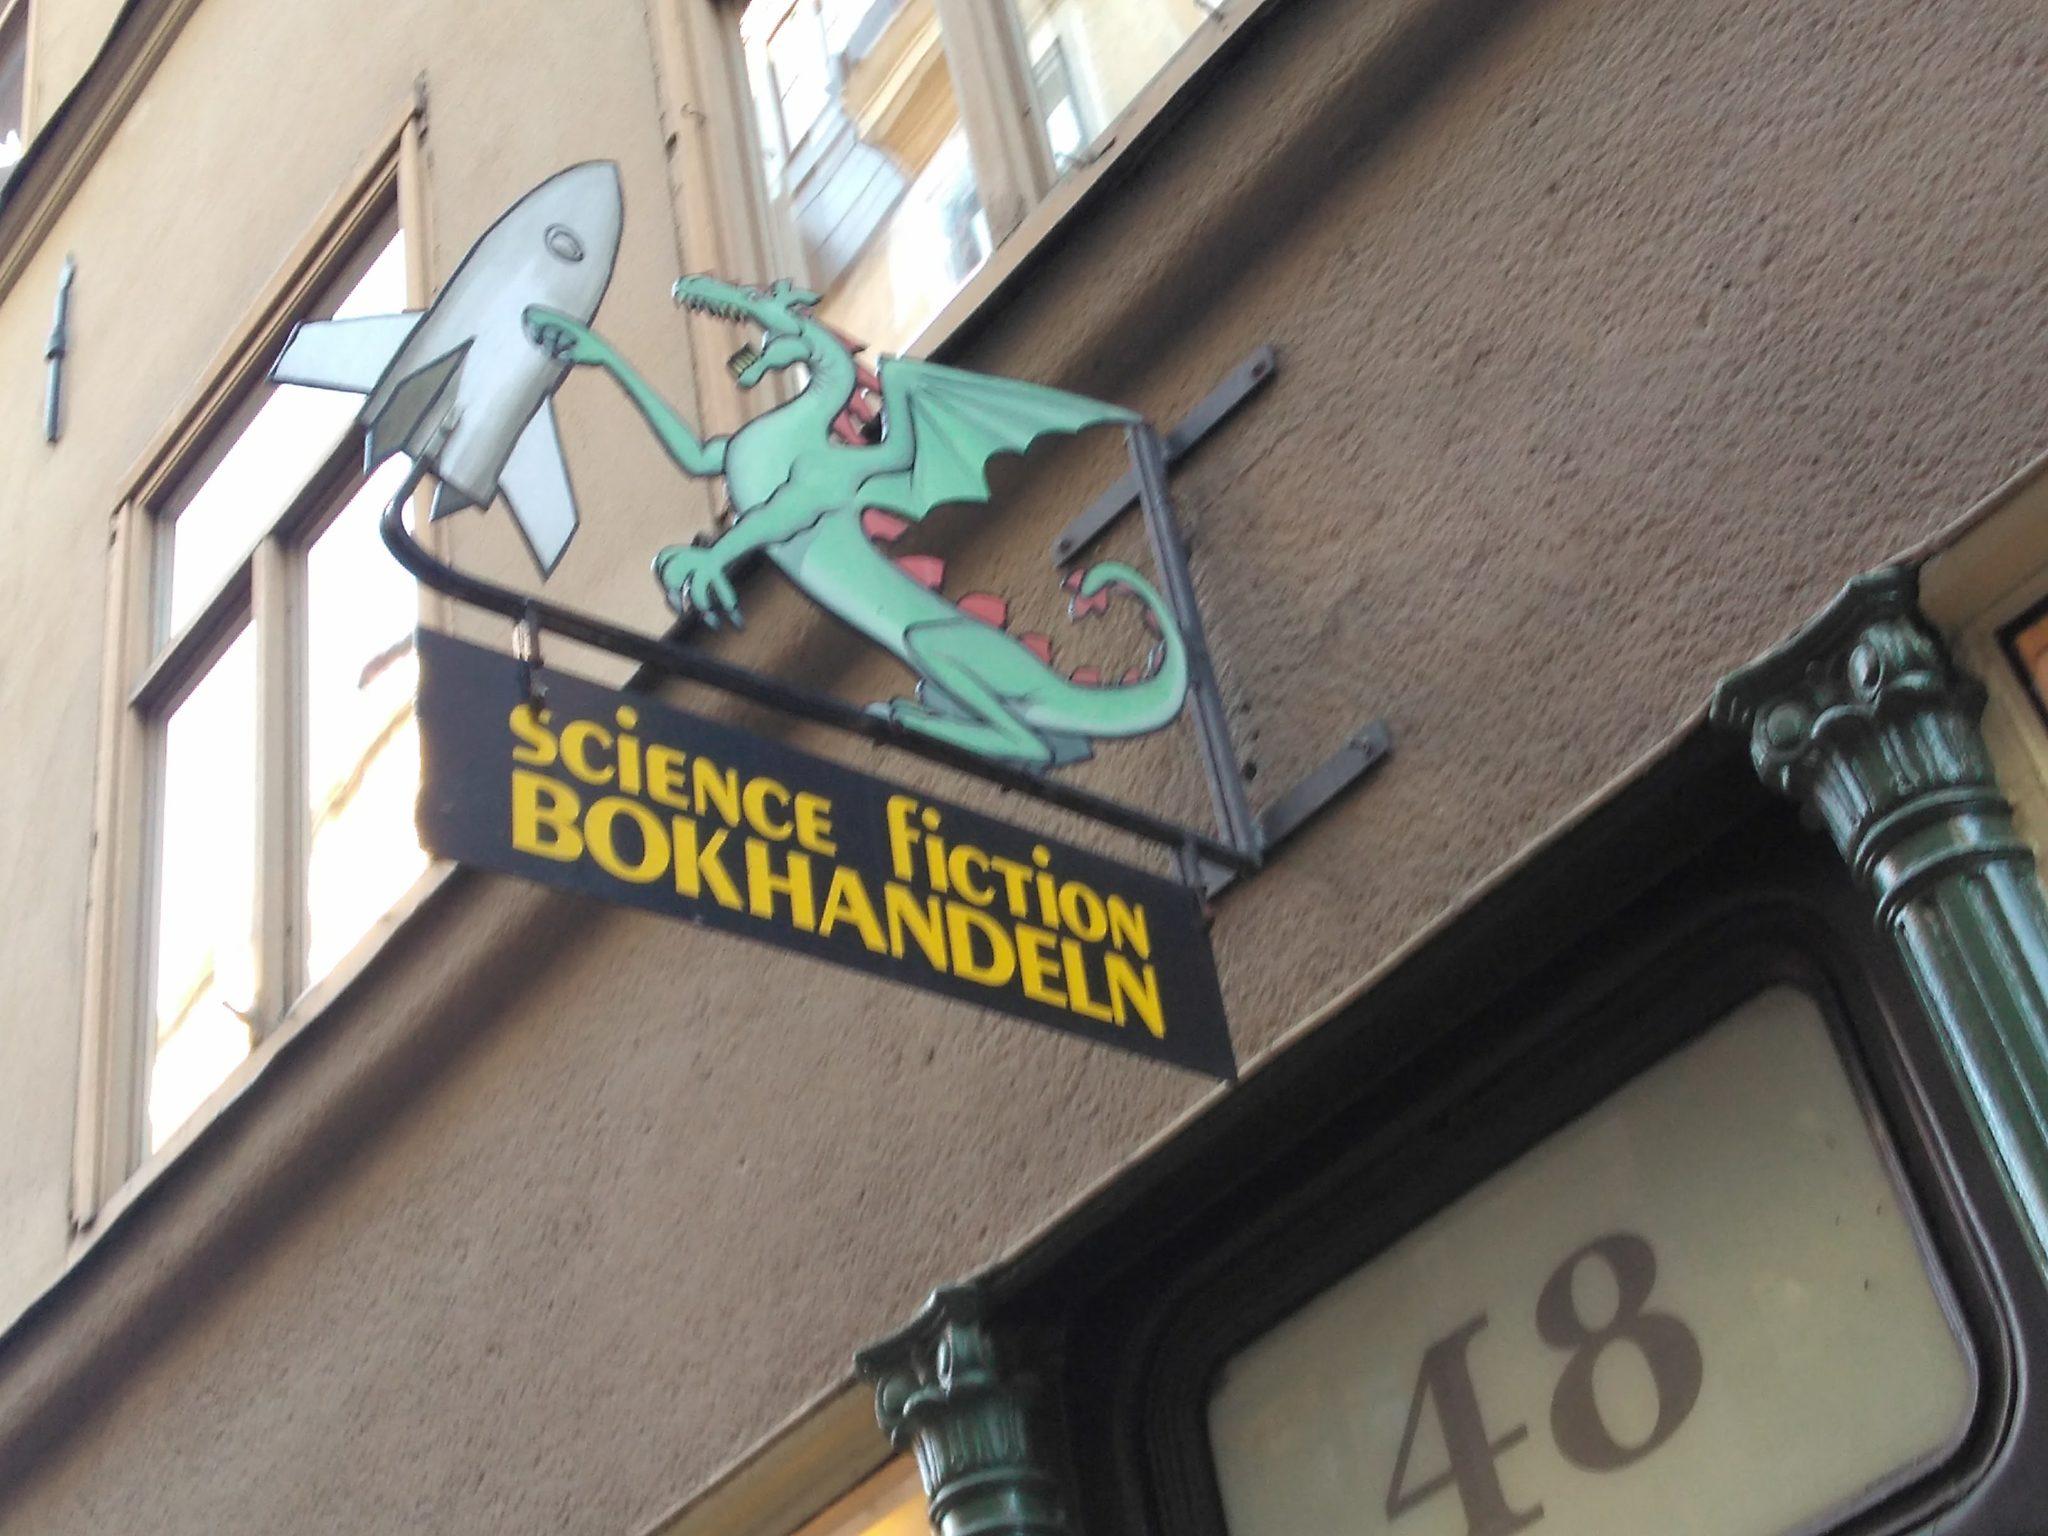 Libroaventuro en Stokholmo 2